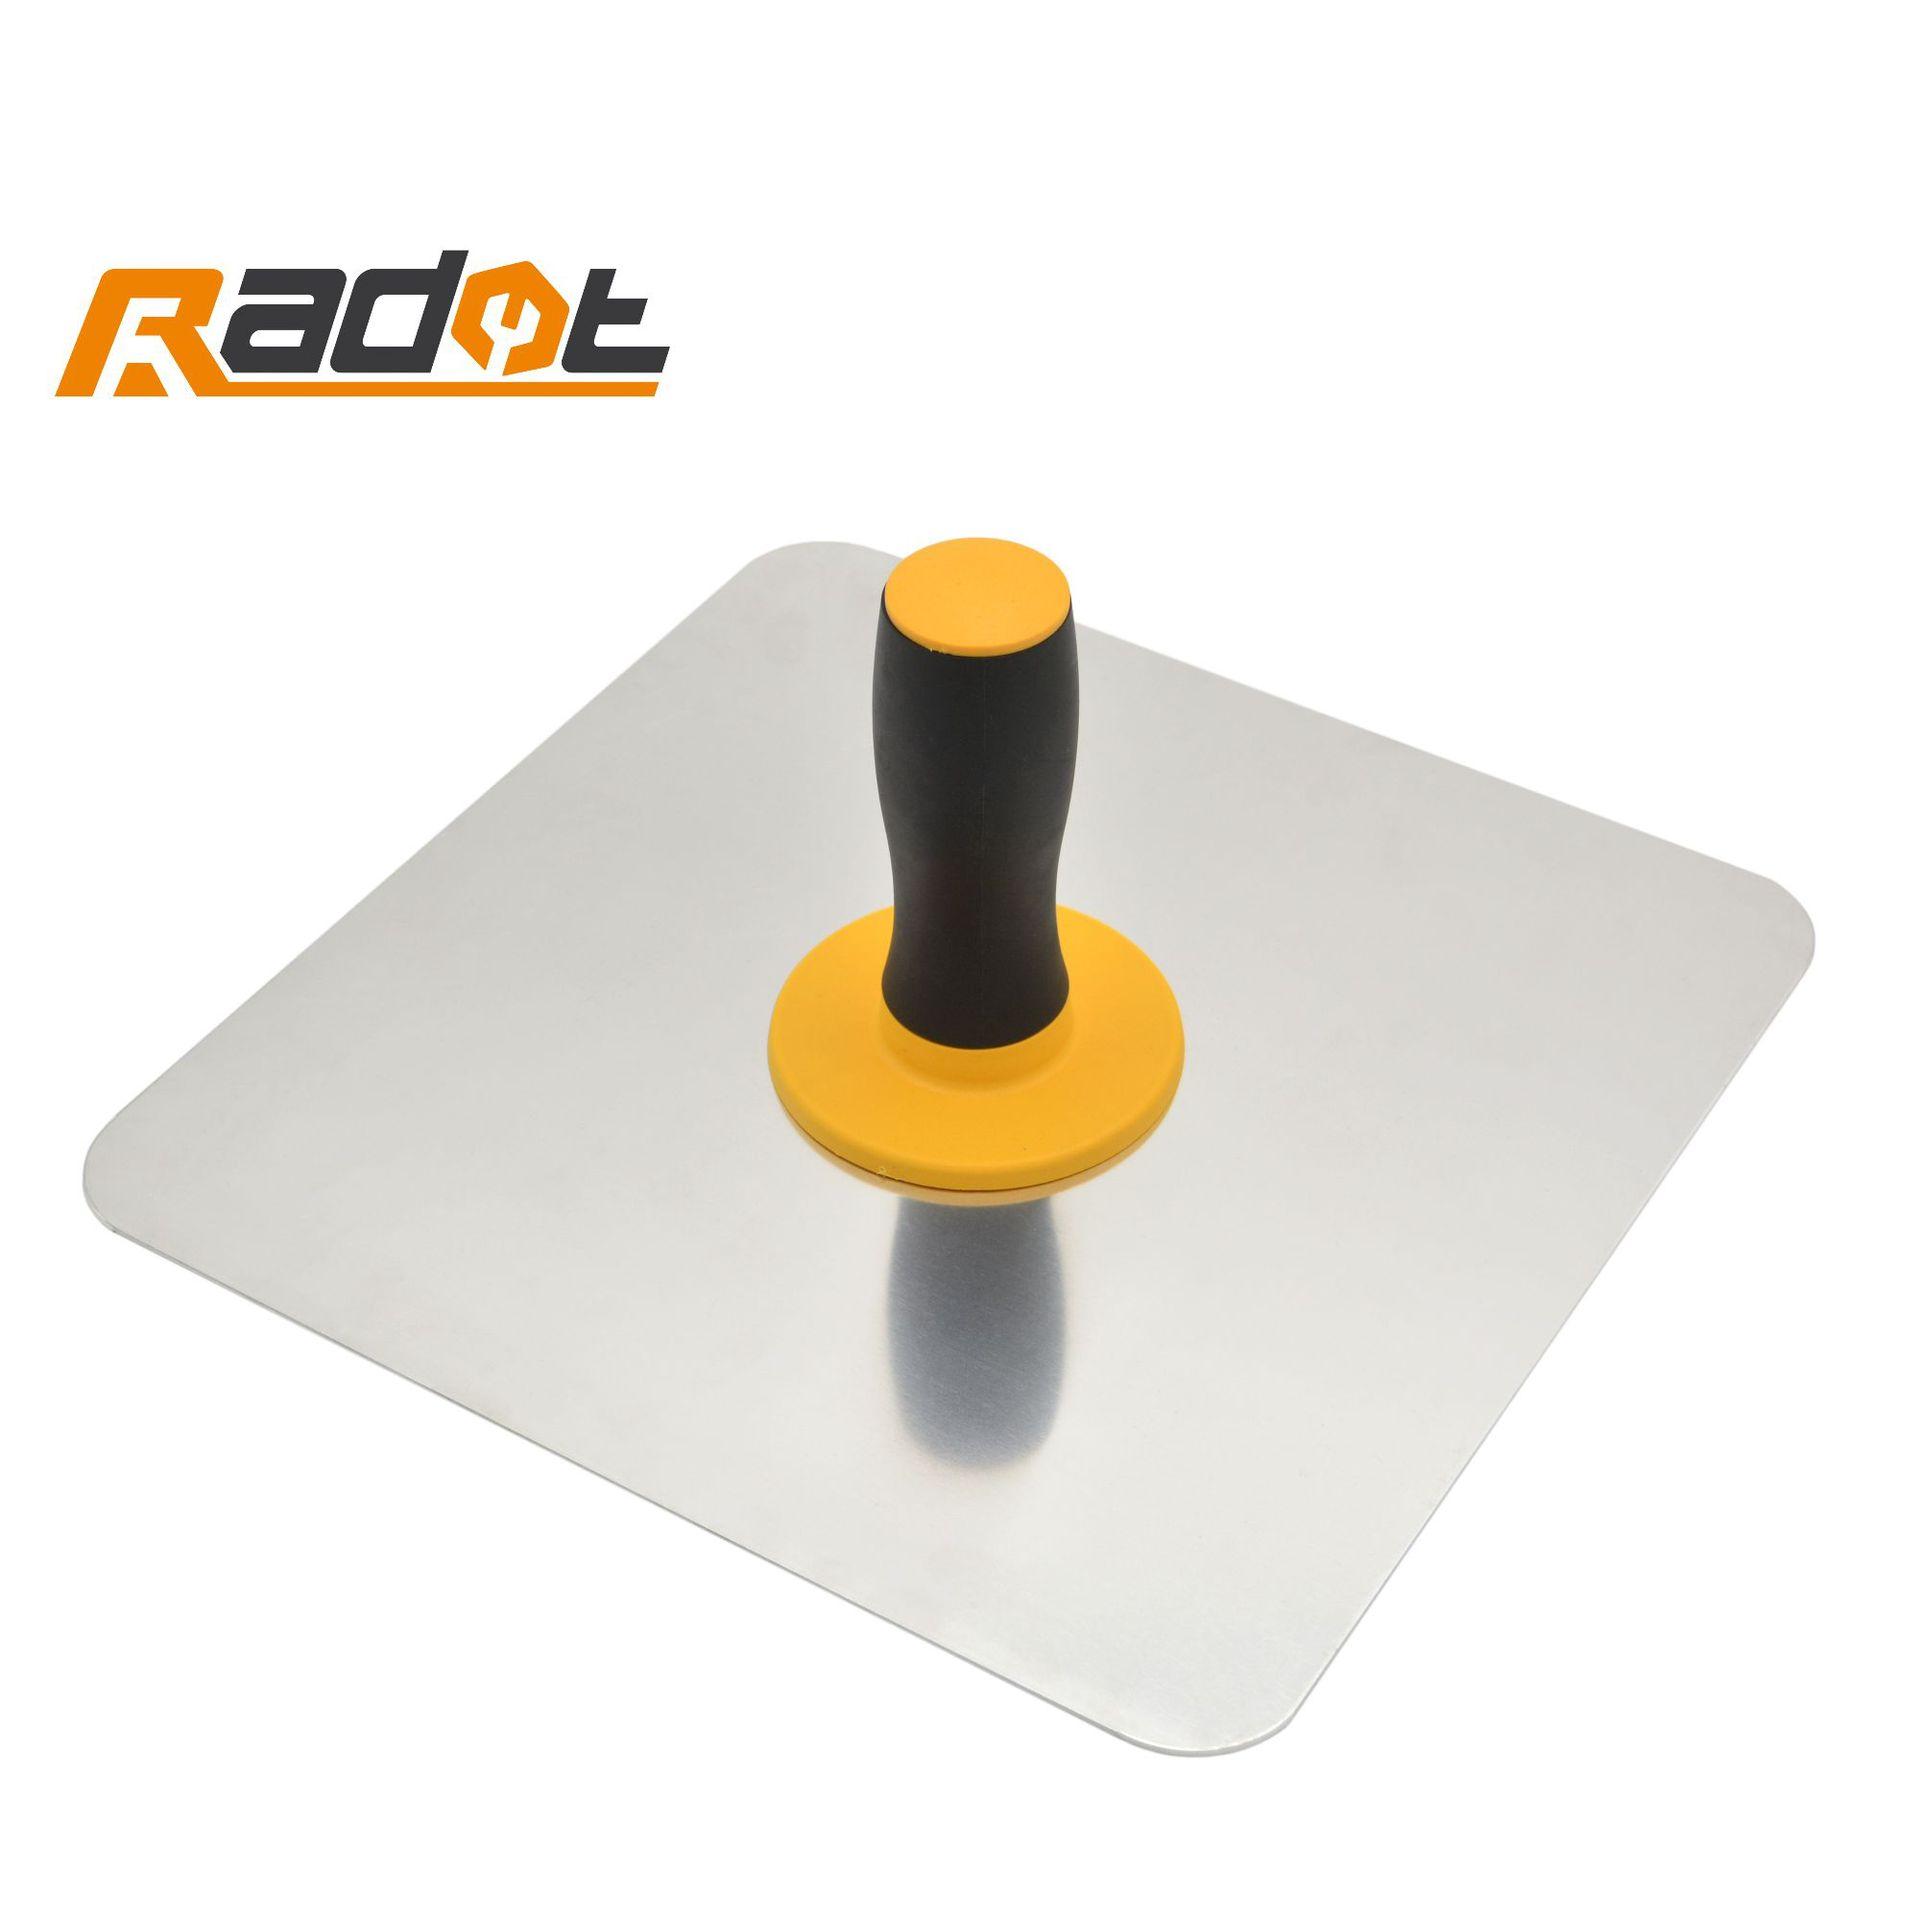 RUIDUOTE Aluminum plate two-color handle holding clay mason tool for masons gray board mason board